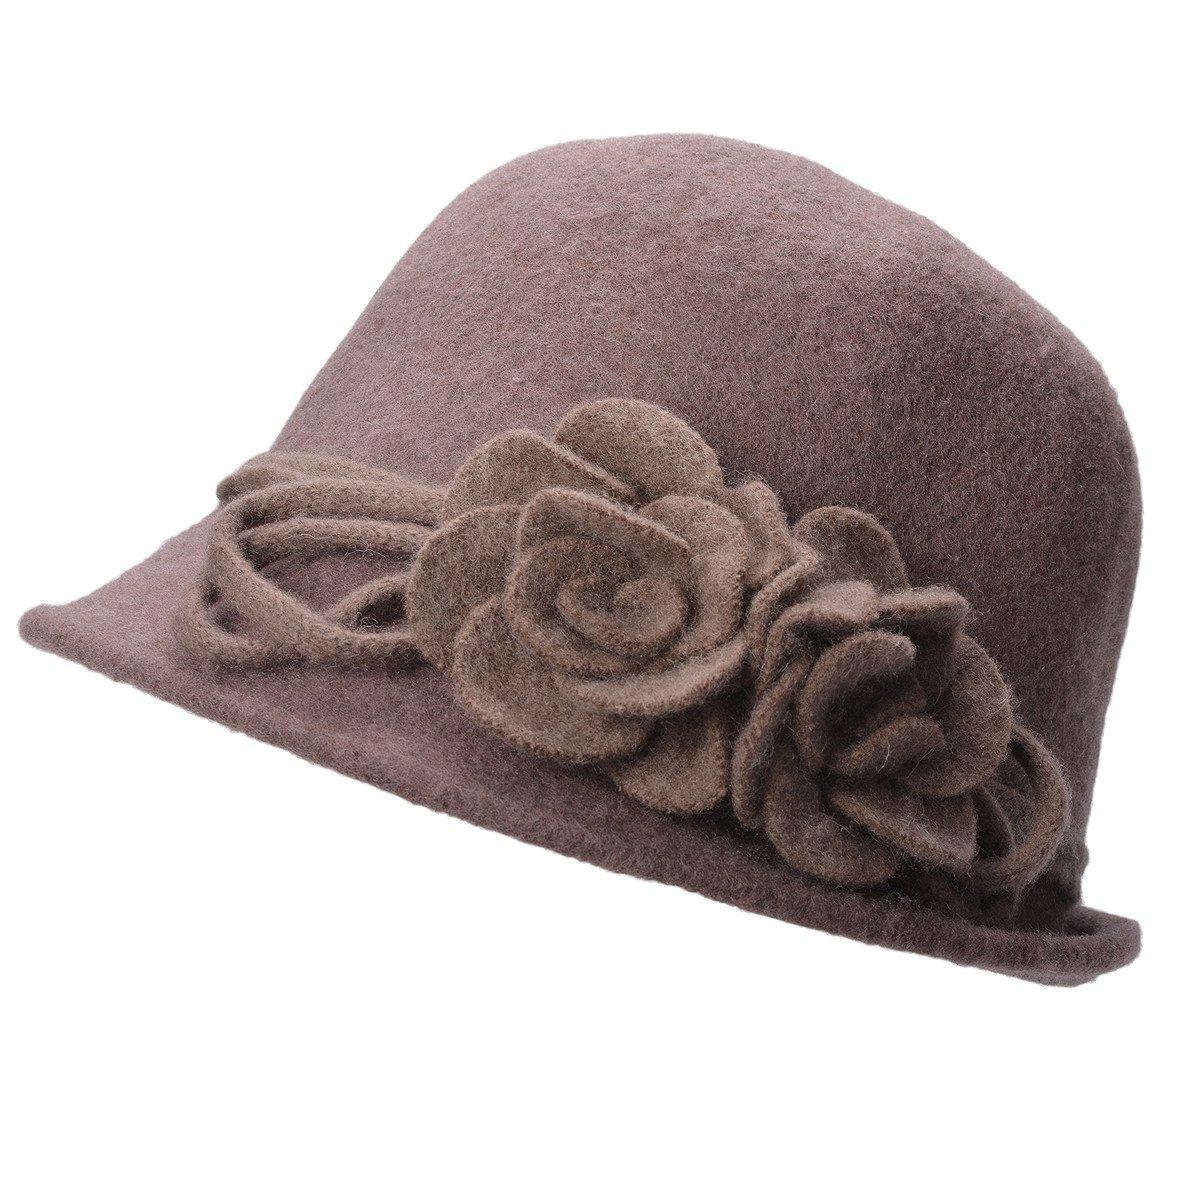 Lawliet Womens Retro Collapsible Soft Knit Wool Cloche Hat Bucket Flower A466 (Khaki)